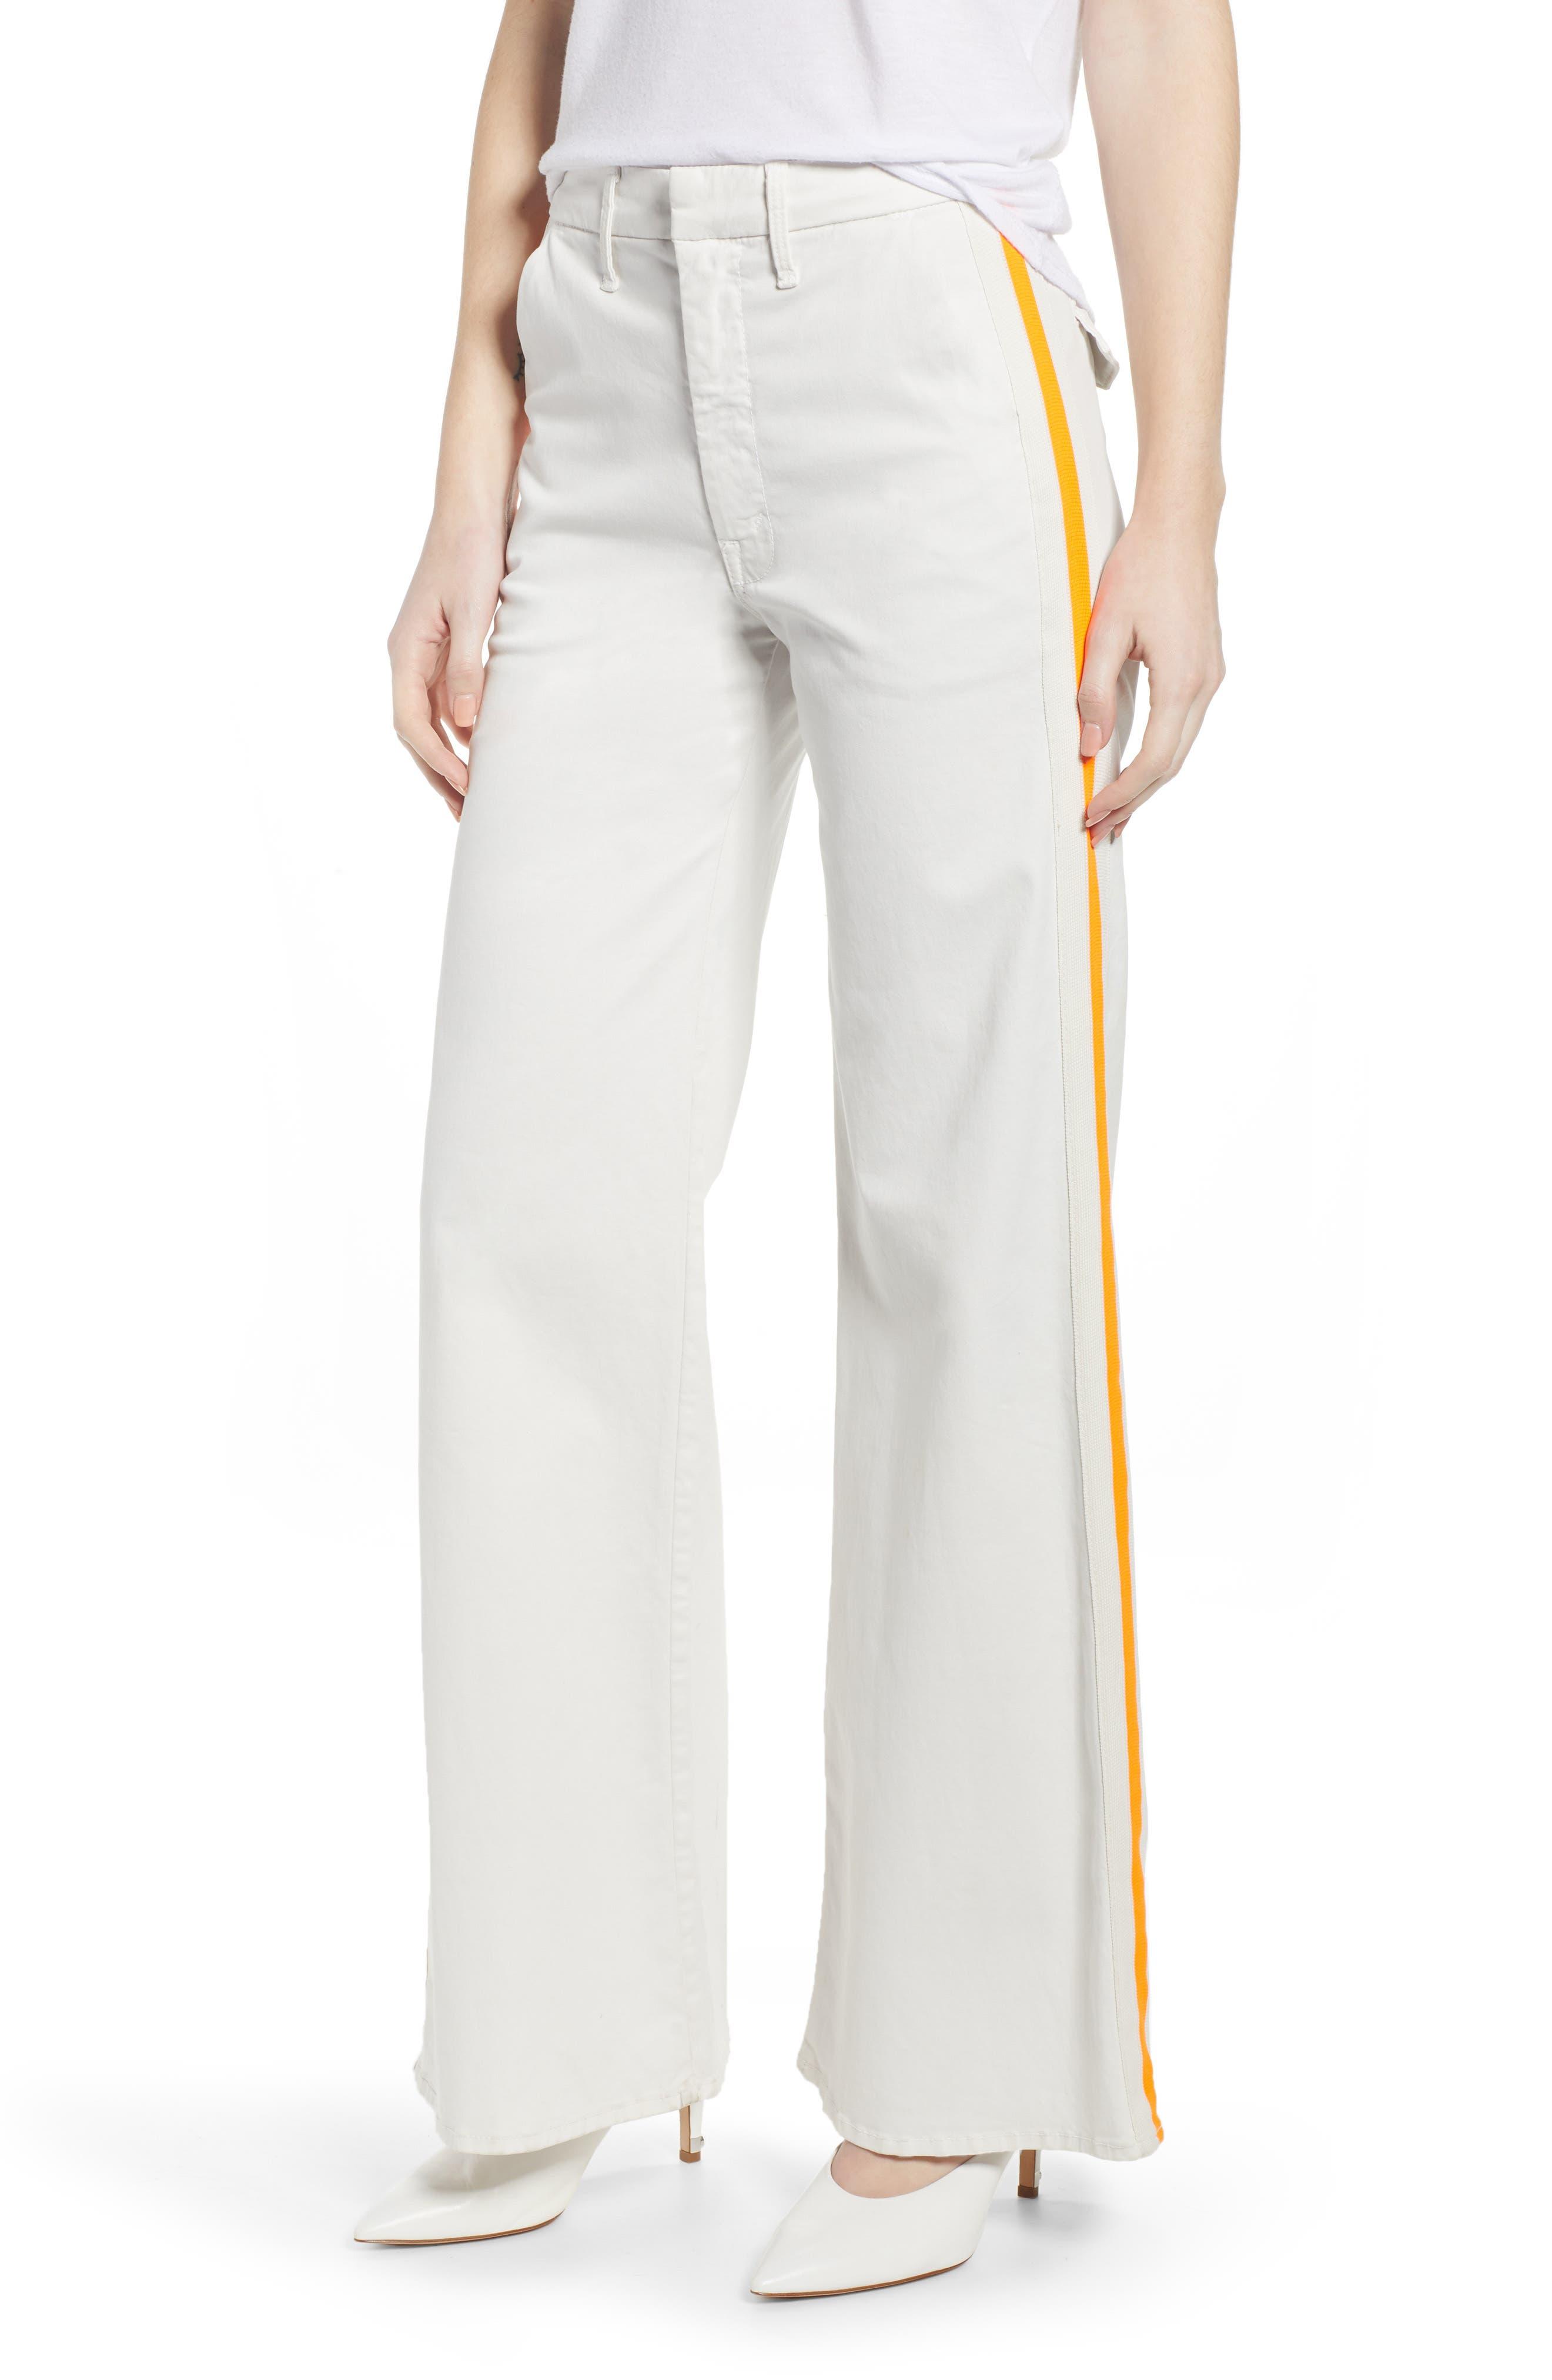 MOTHER The Roller Flare Jeans, Main, color, CHALK/ ORANGE RACER